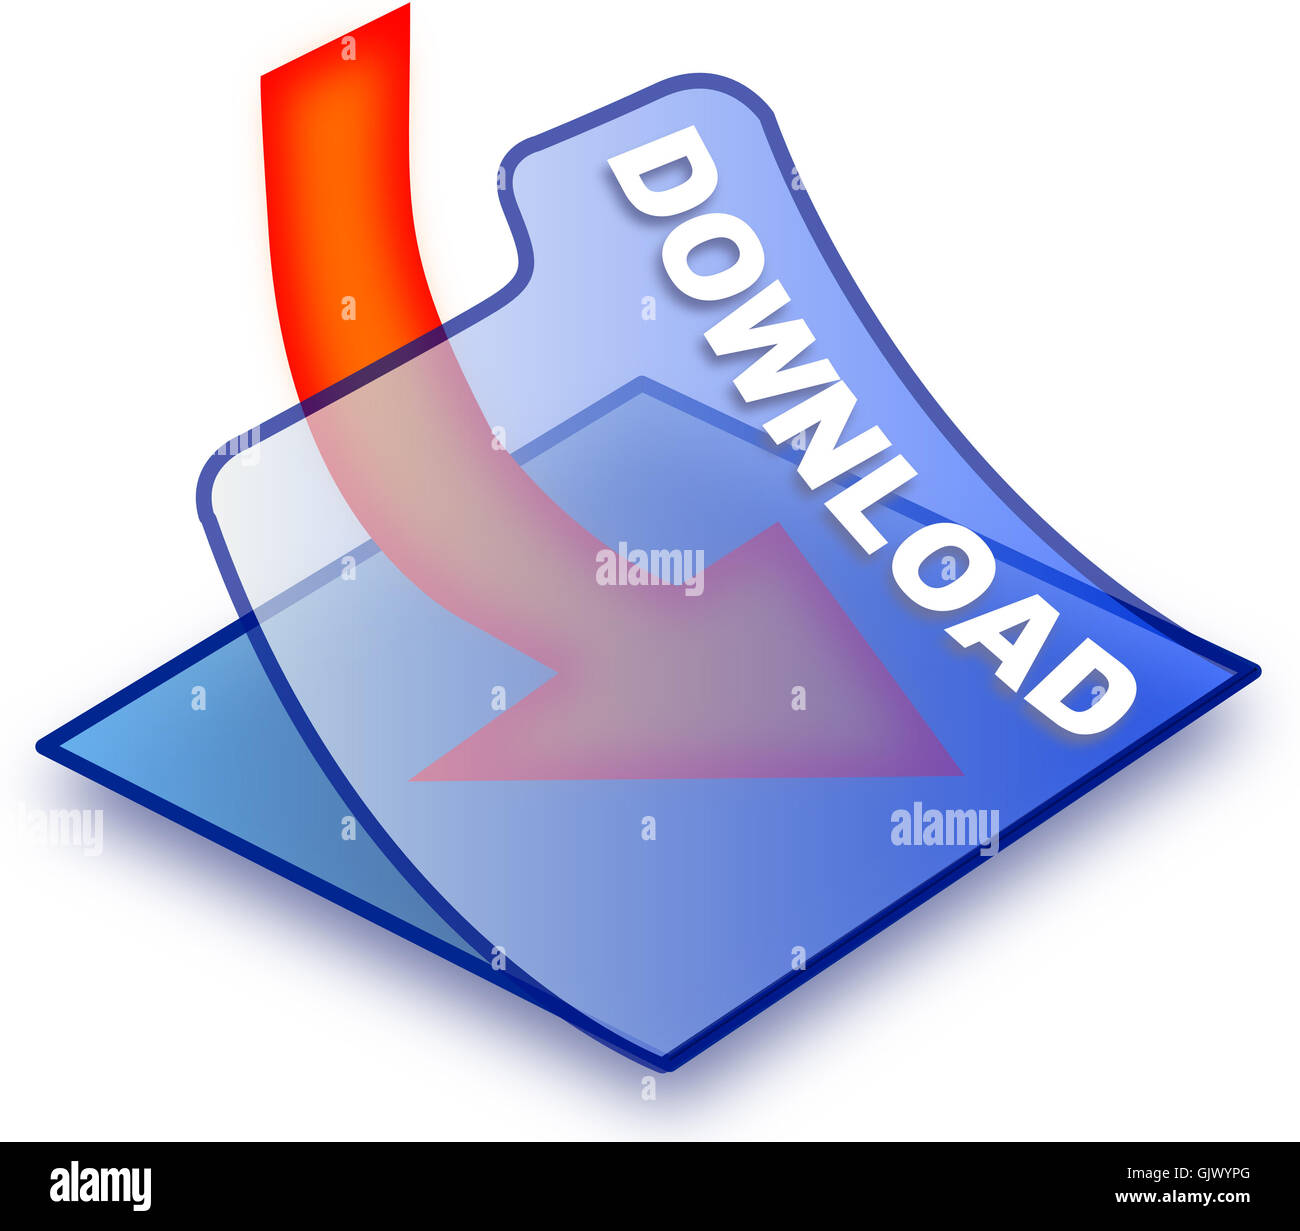 descargar icono Imagen De Stock